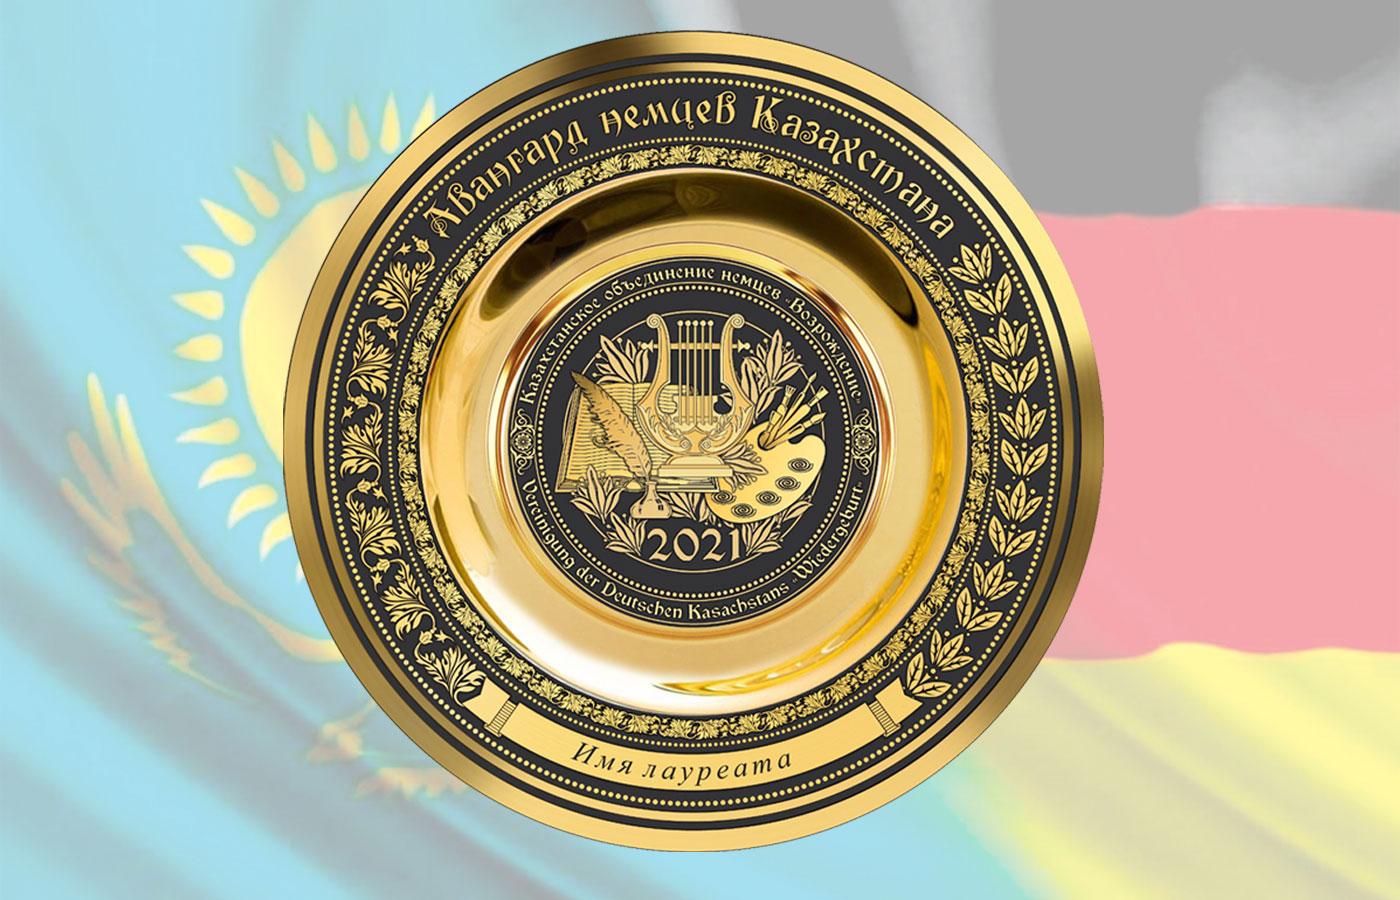 Стартует конкурс «Авангард немцев Казахстана»